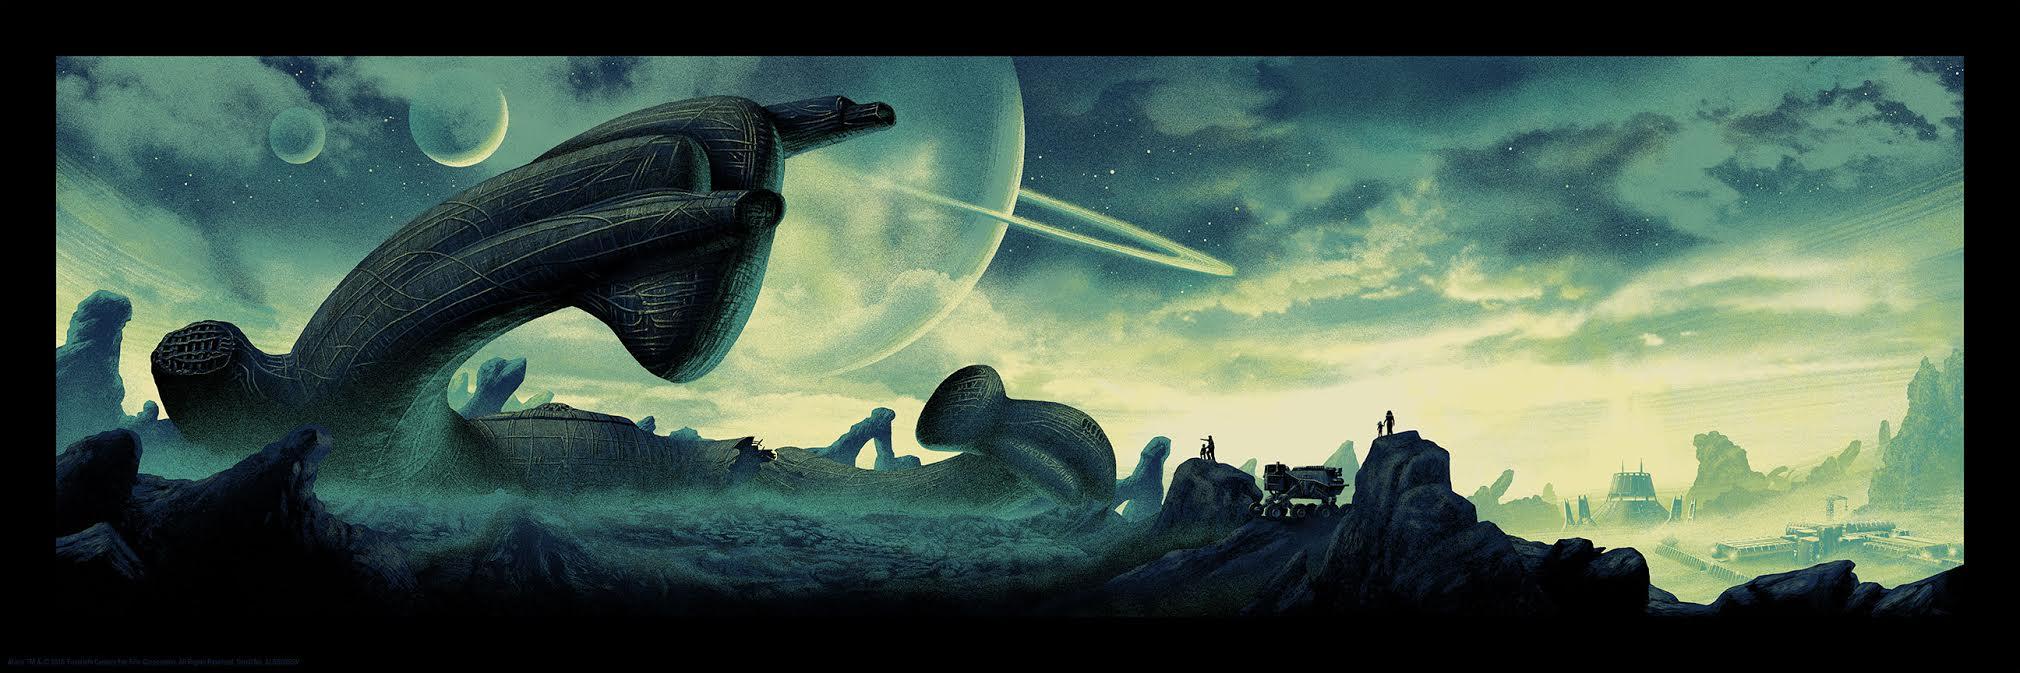 'Alien' limited edition print from Mark Englert at Bottleneck Gallery